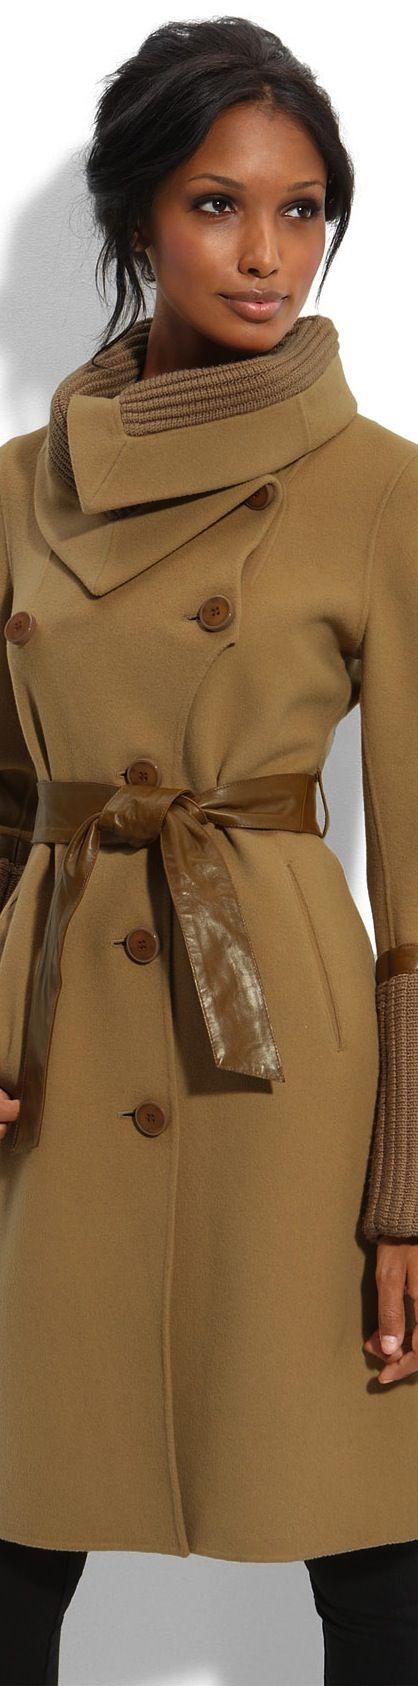 Beautiful Beige Winter Coat, Love The Collar - Fall/Winter Fashion